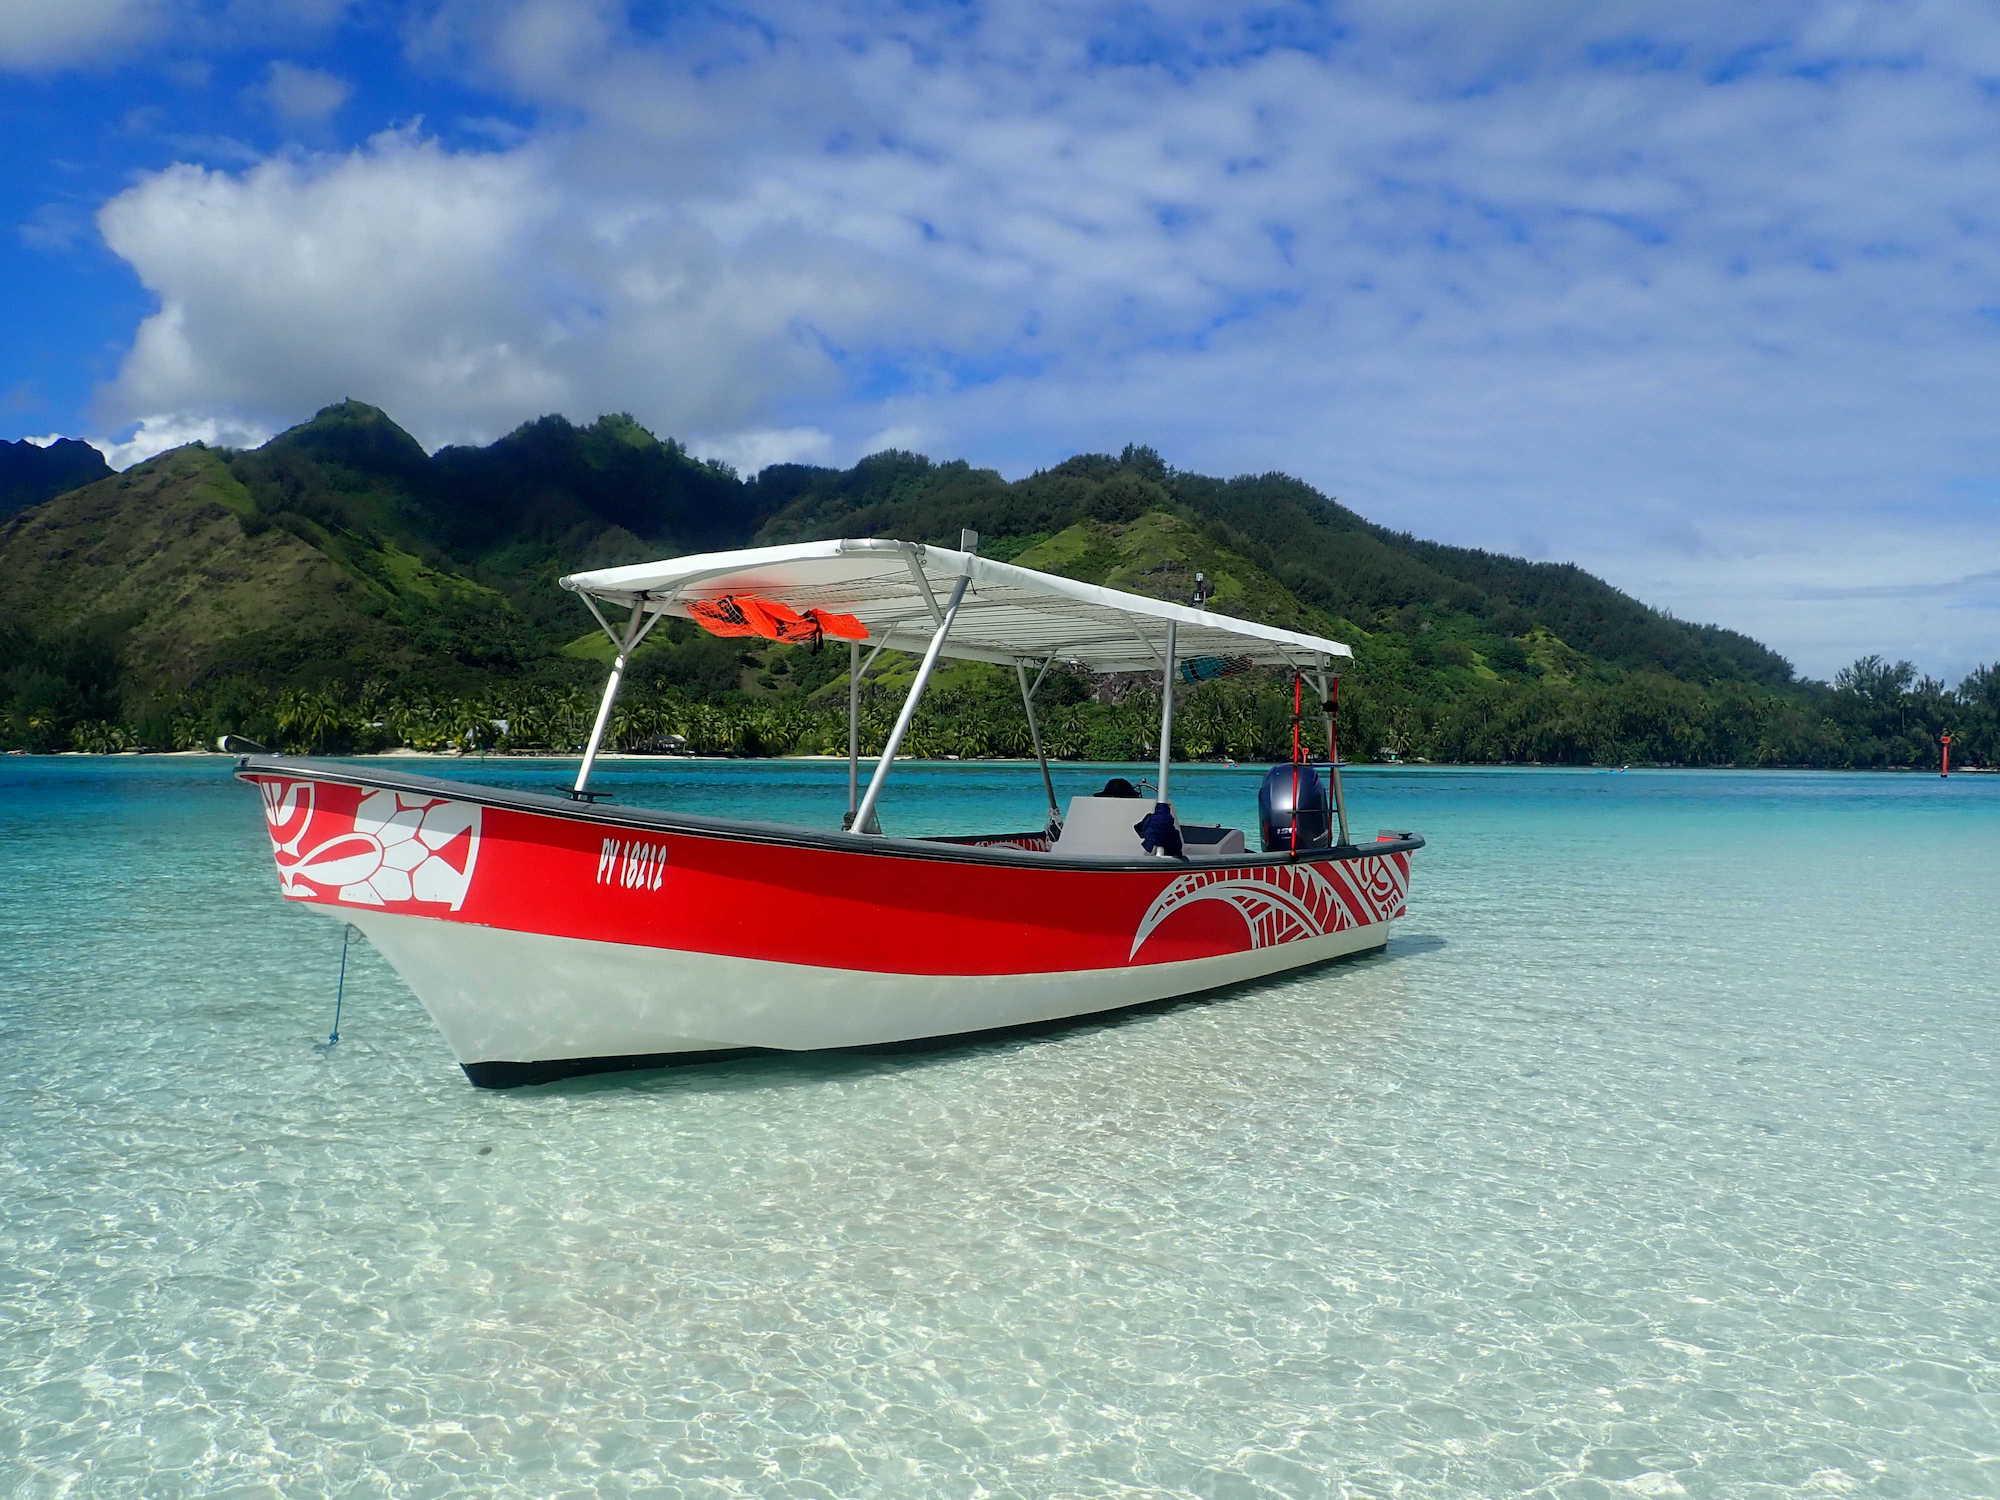 https://tahititourisme.de/wp-content/uploads/2020/09/Boat-Hinaloa.jpg